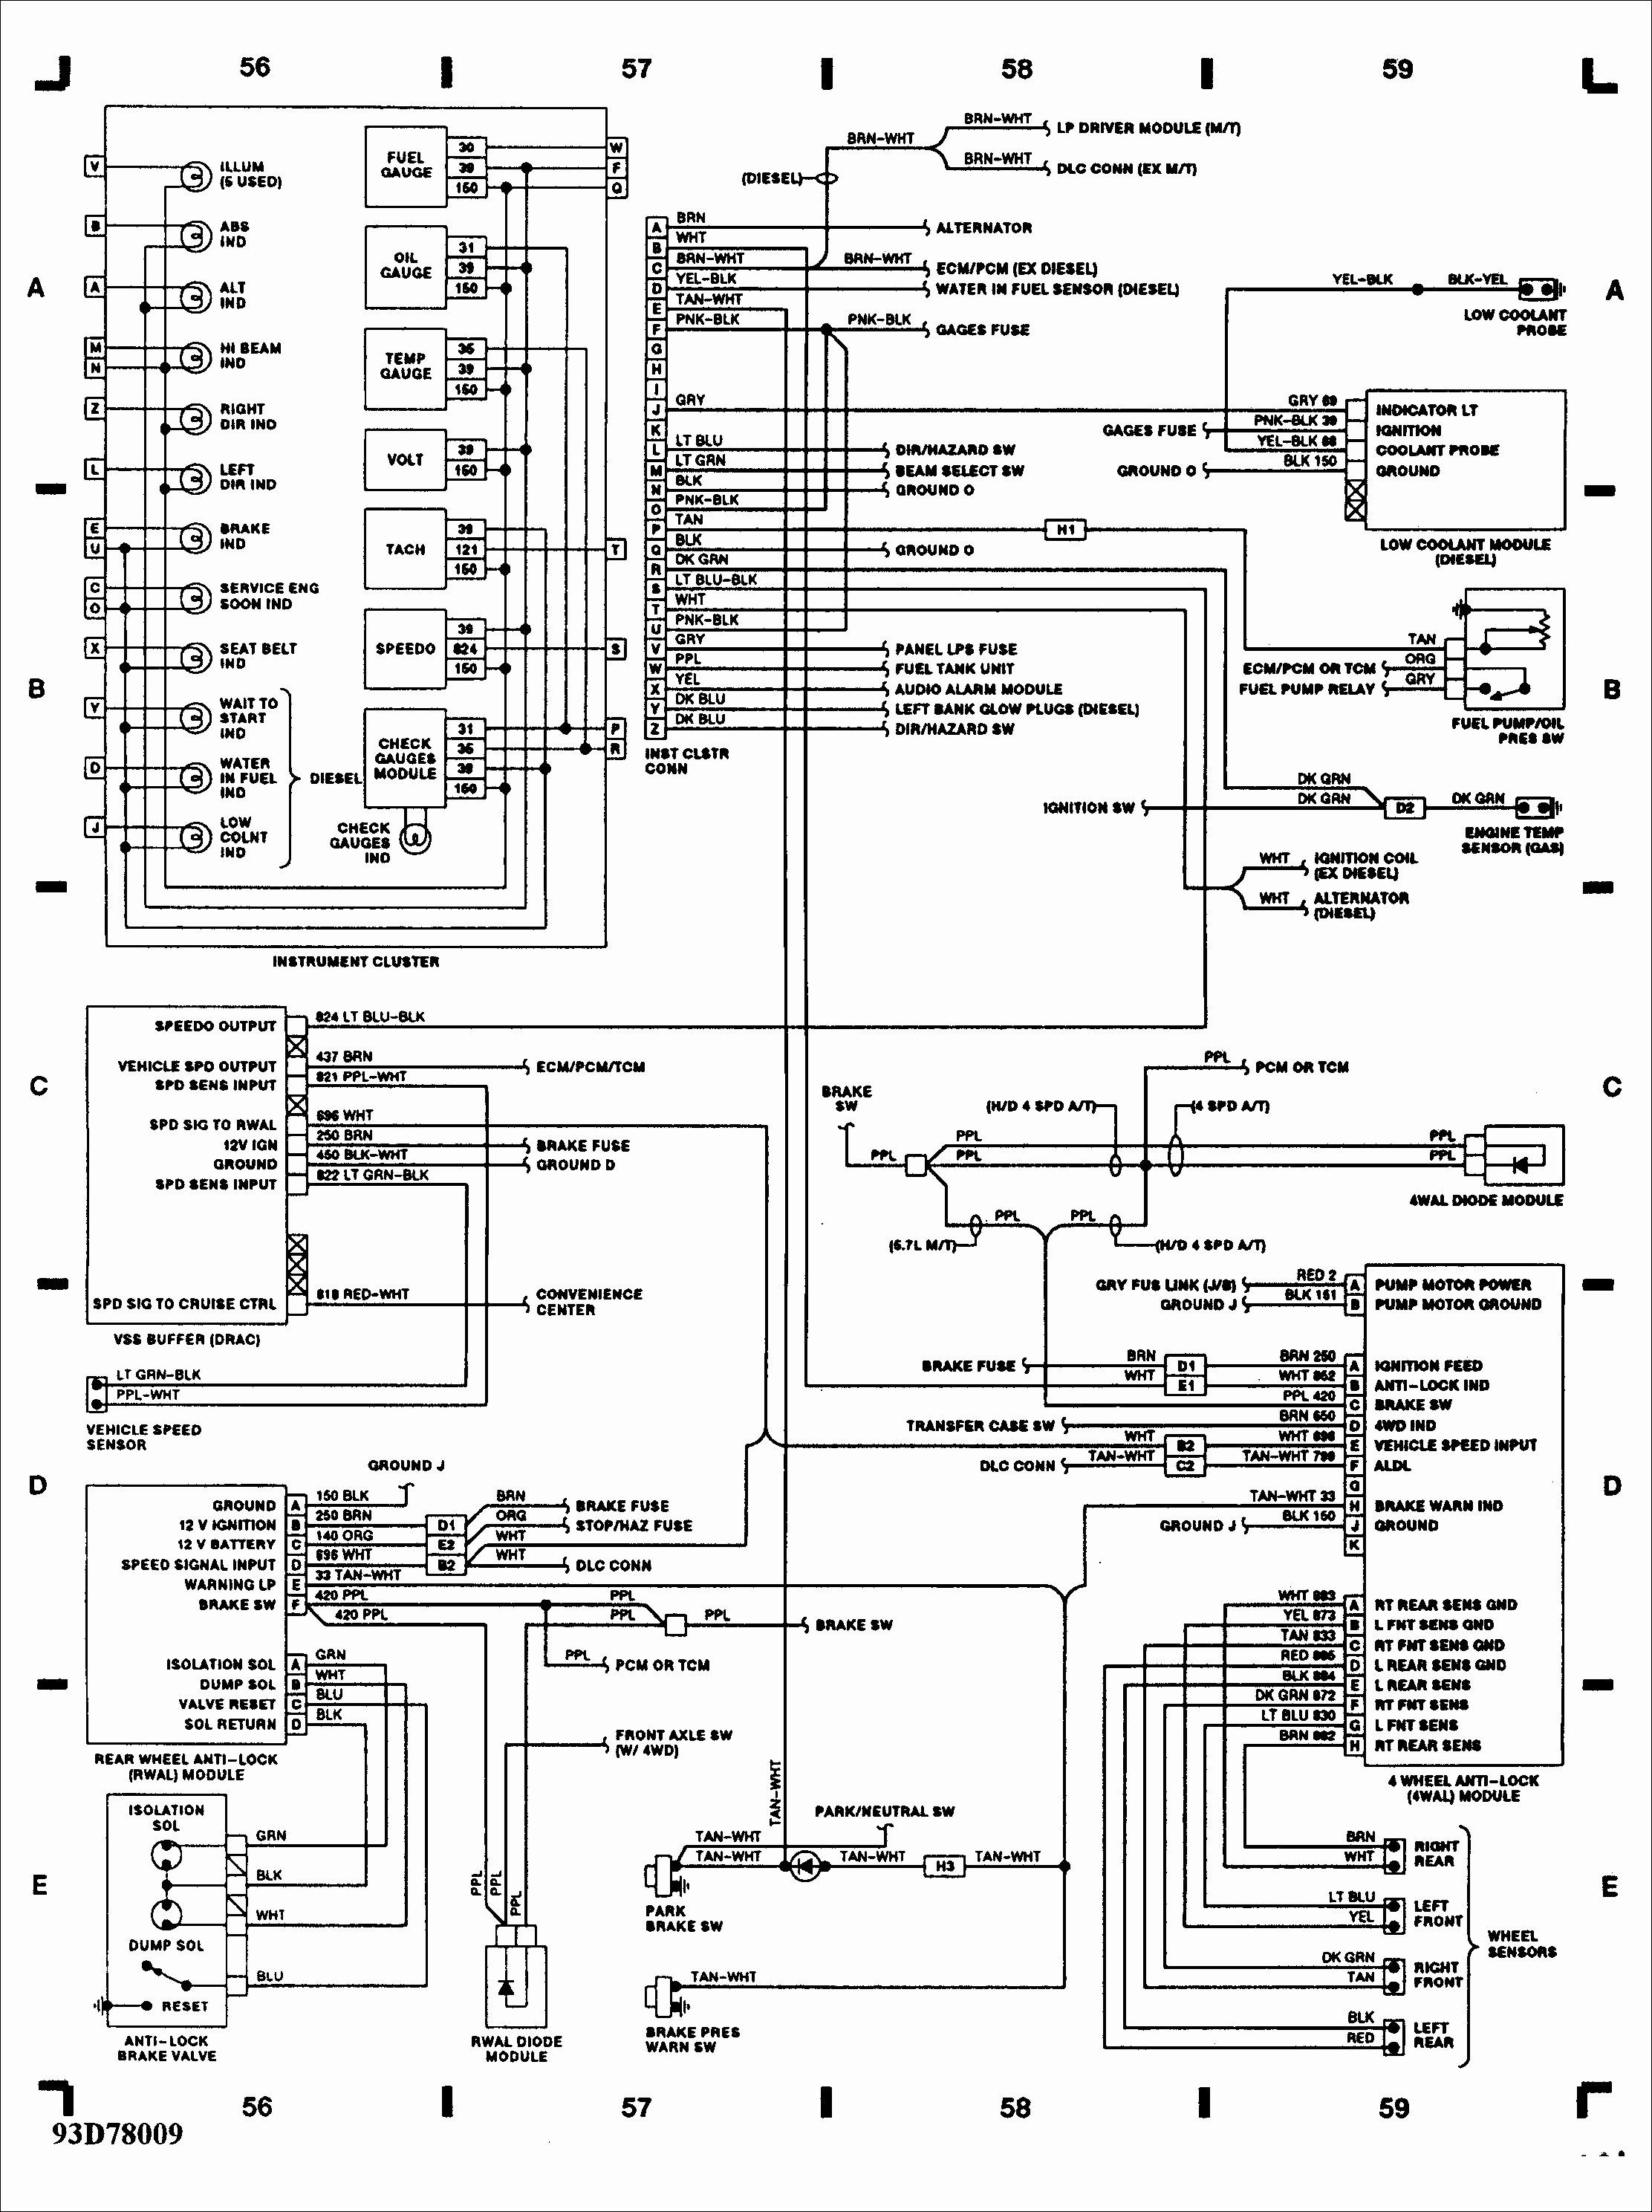 Throttle Valve Diagram Wiring Diagram Ac Save Smc Valve ... on smc plug, smc switch, smc connector,